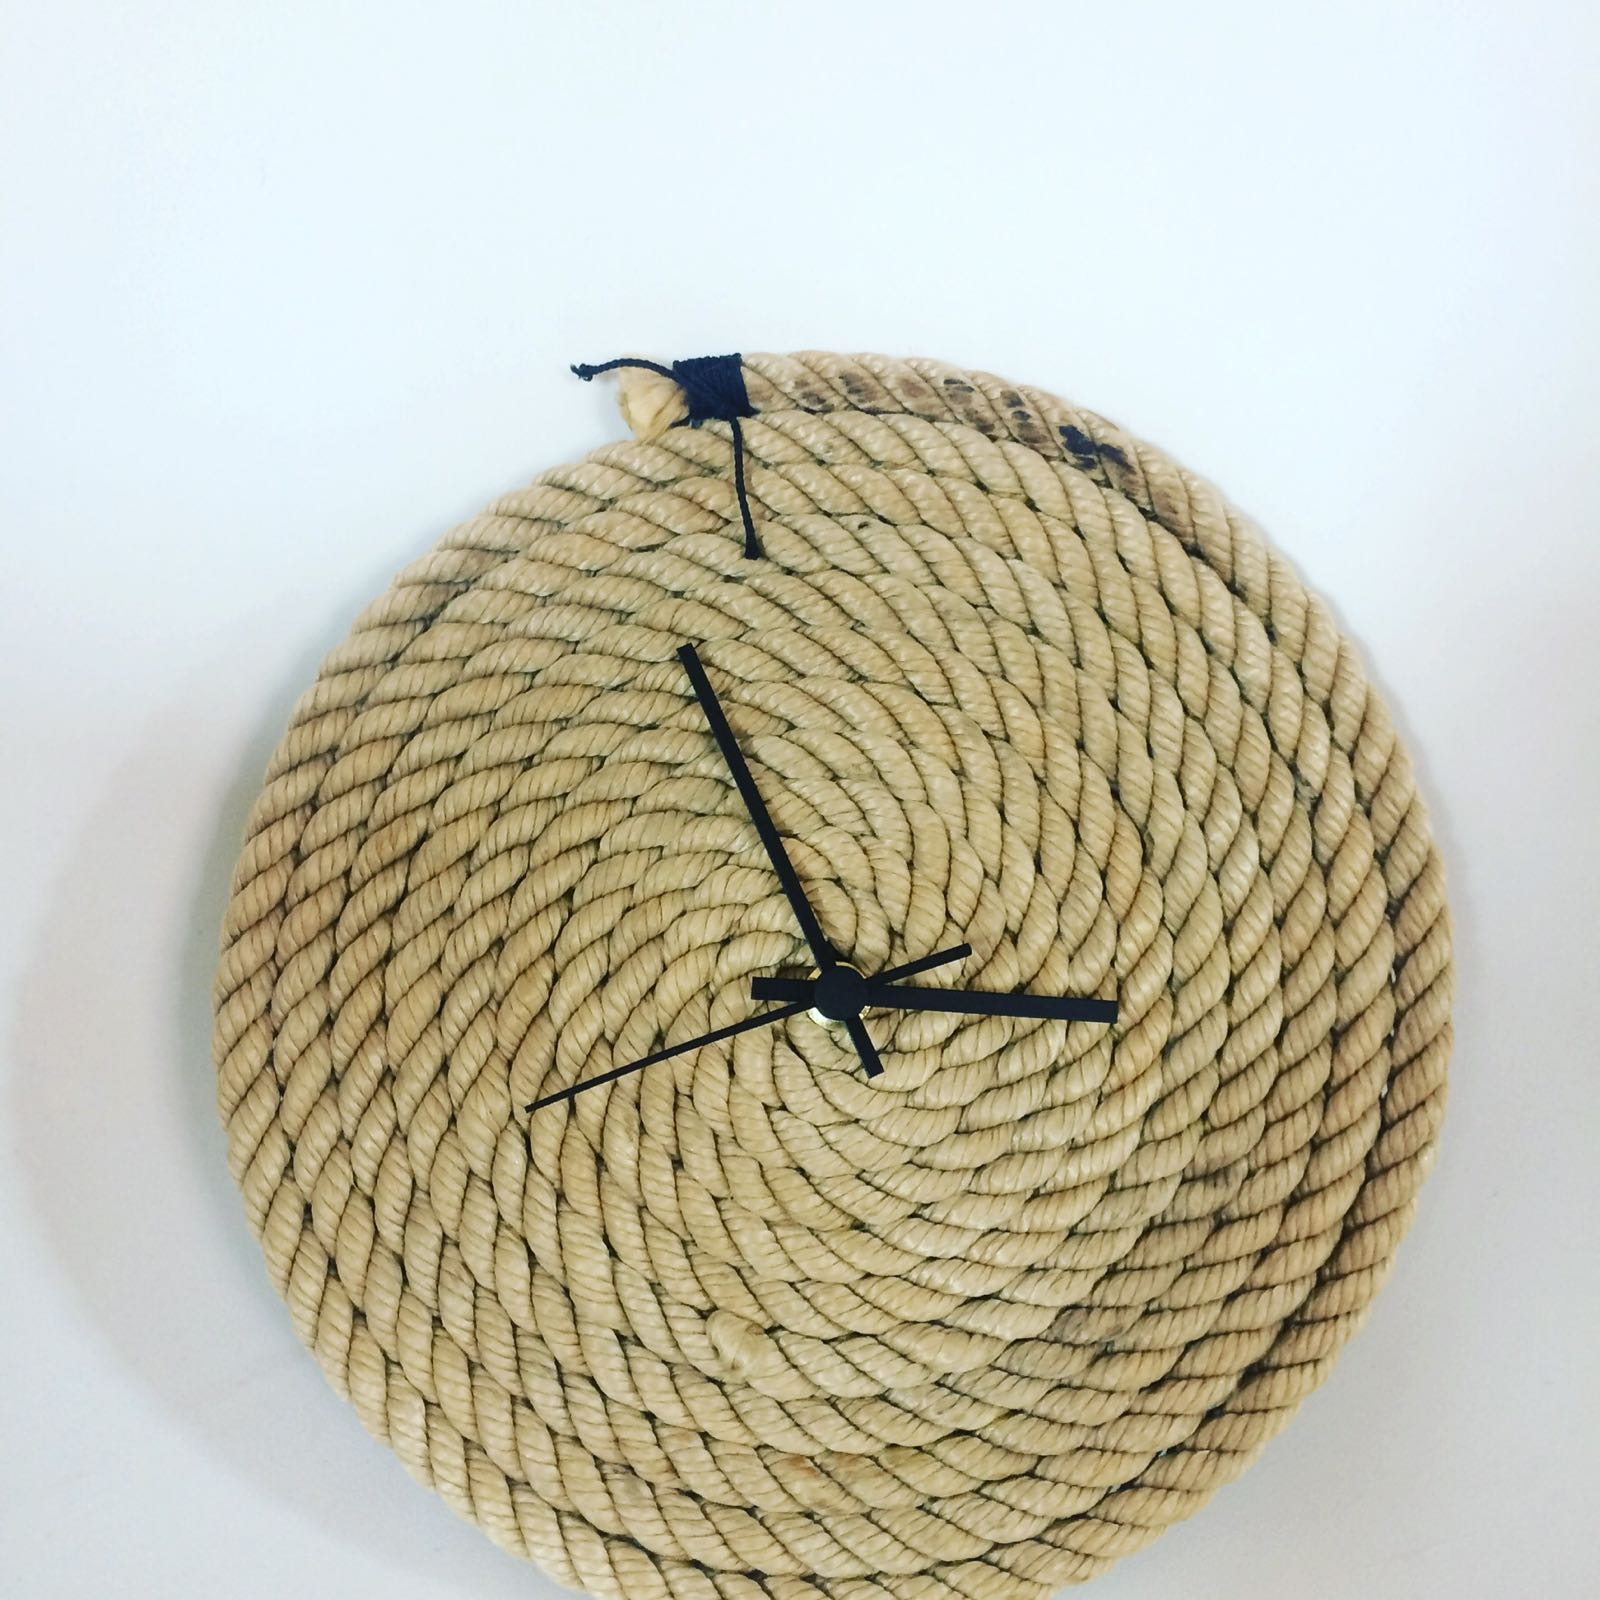 Fischereidesign - Wanduhr aus Tampen